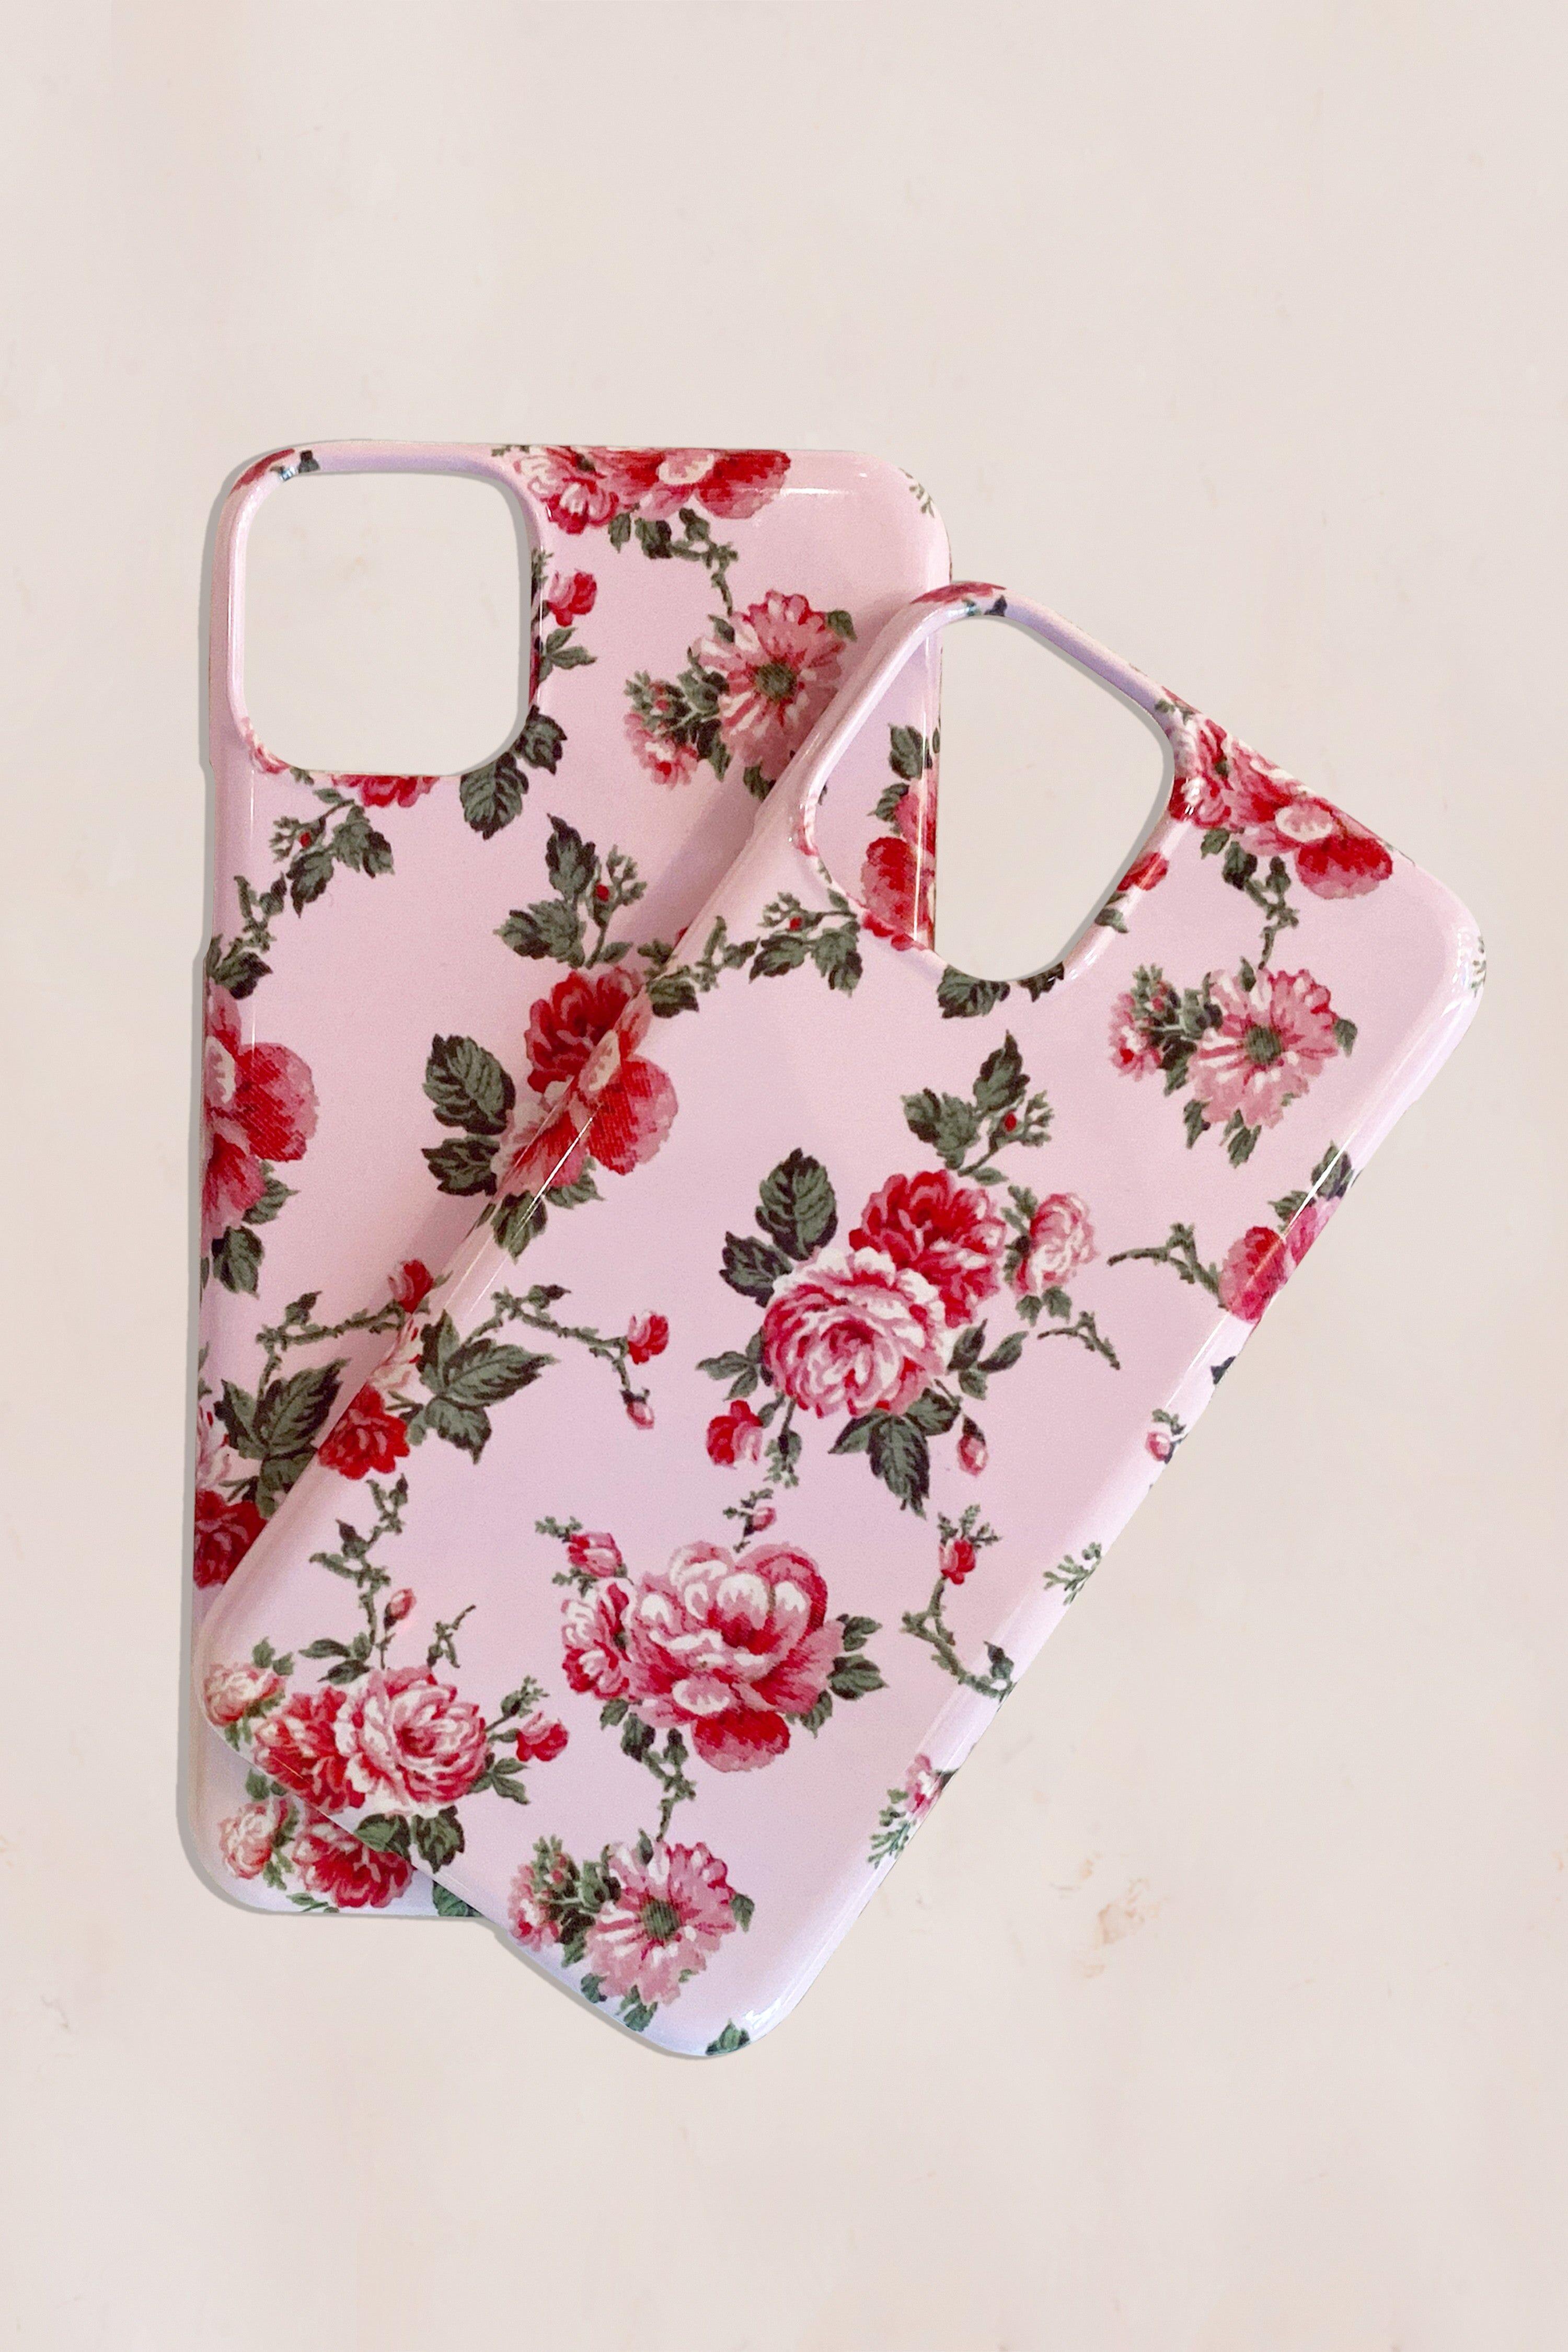 MINNIE AND EMMA Women's LoveShackFancy x Minnie and Emma iPhone 11 Pro Case